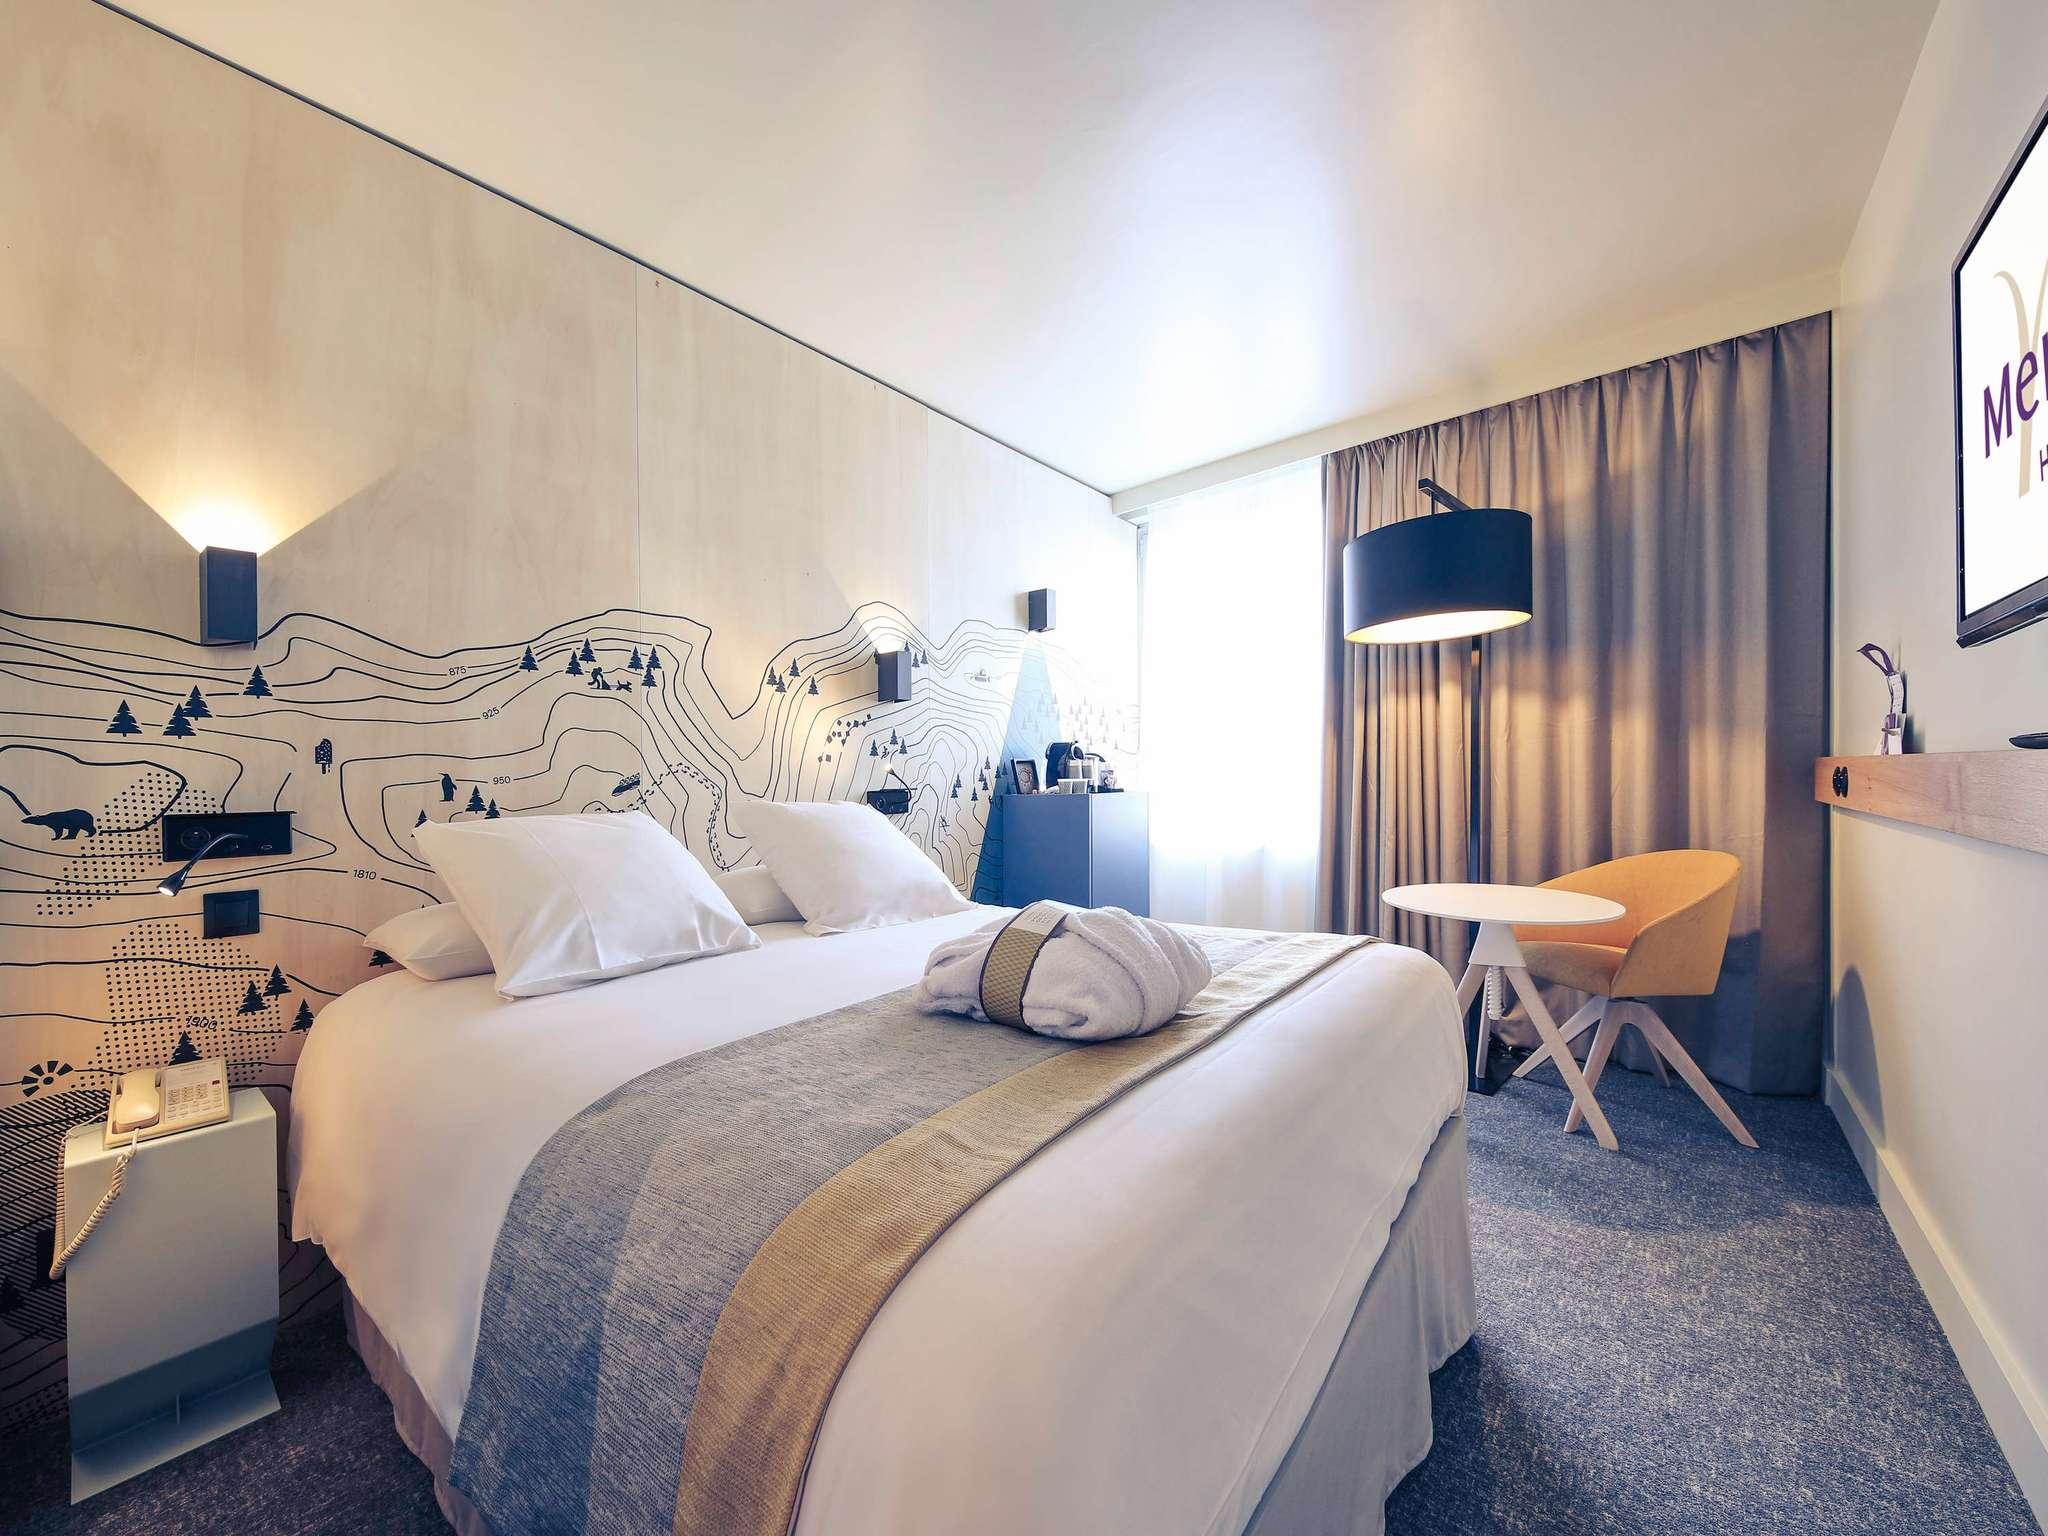 Hotel – Hôtel Mercure Grenoble Centre Alpotel